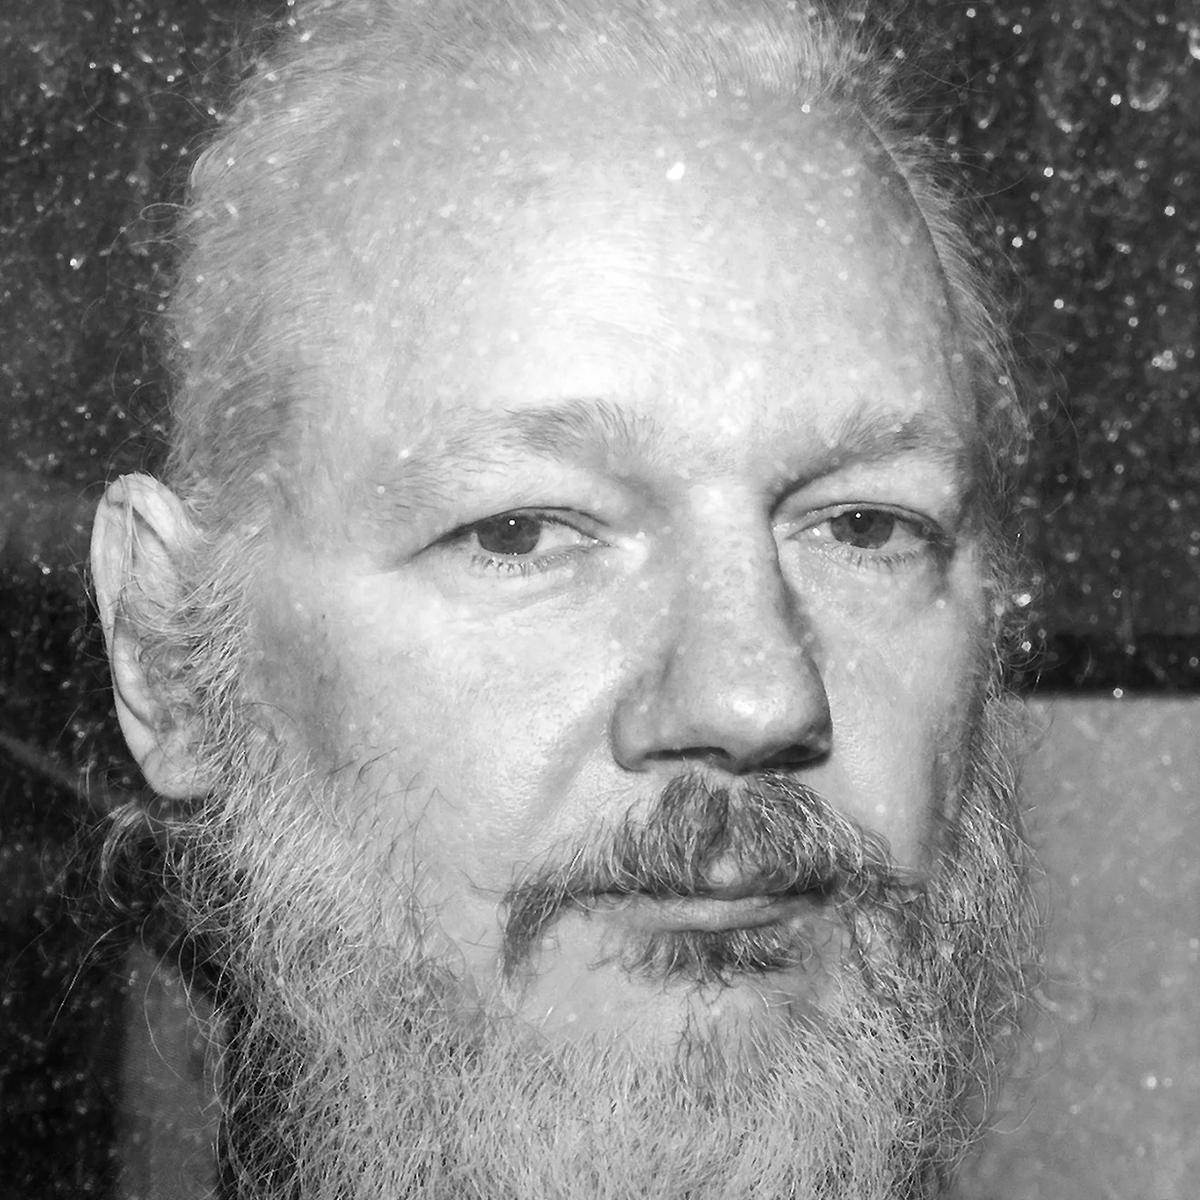 #PardonAssange @POTUS @WhiteHouse #Assange @JimmyDoreShow #JimmyDore #SaturdayThoughts #SaturdayMotivation      #MAGA⚖️🇺🇸☮️